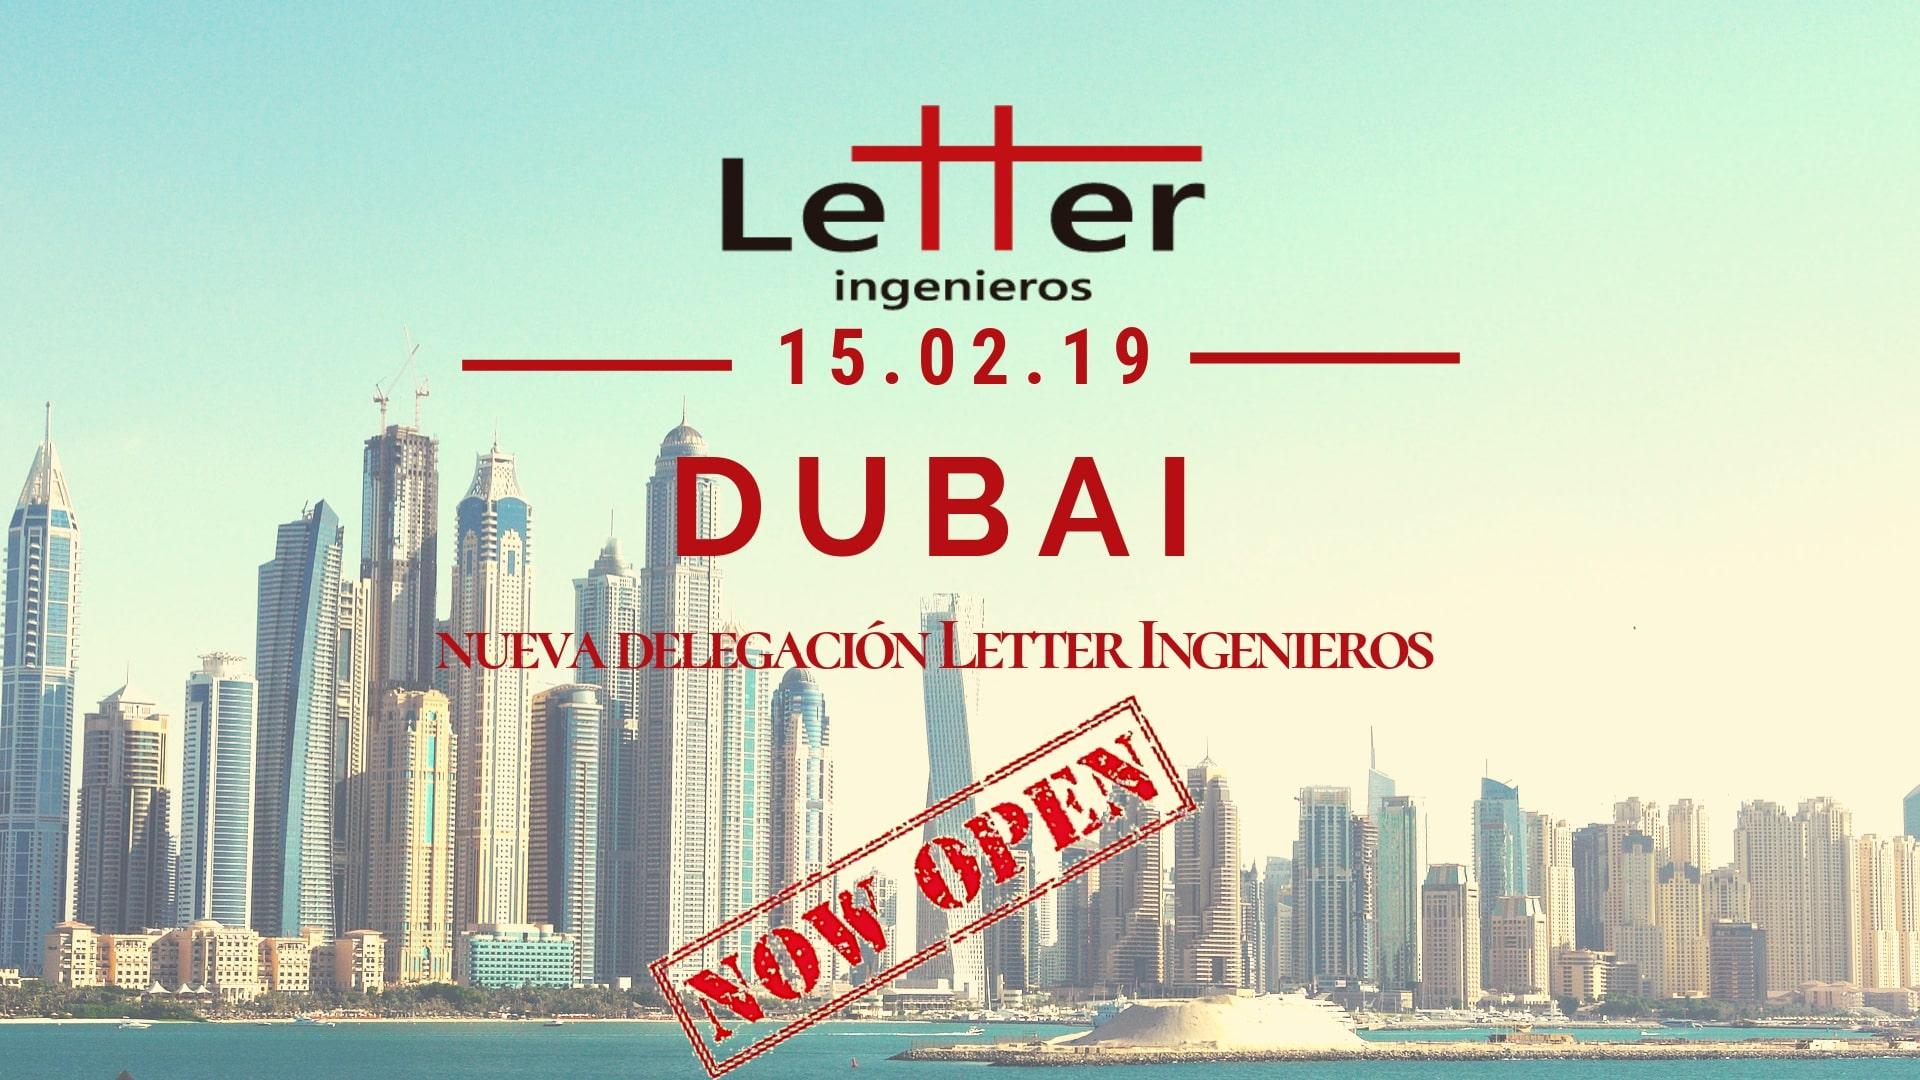 Oficina Dubai Letter Ingenieros